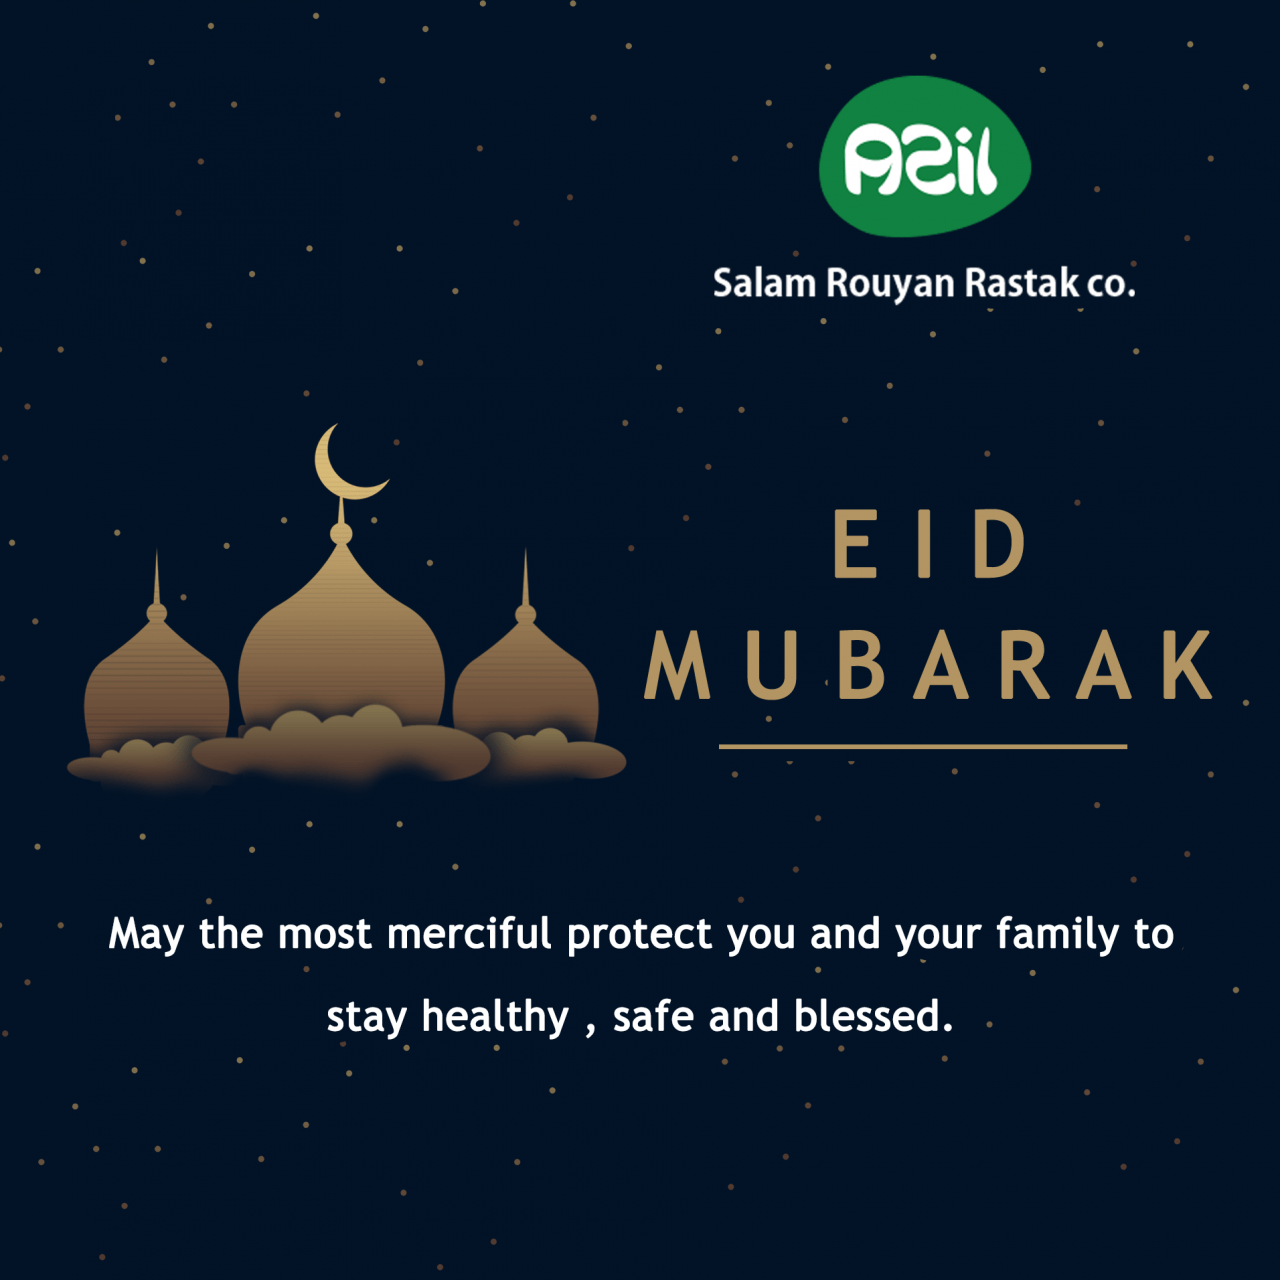 eid fetr 1280x1280 - Eid al-Fitr Mubarak.